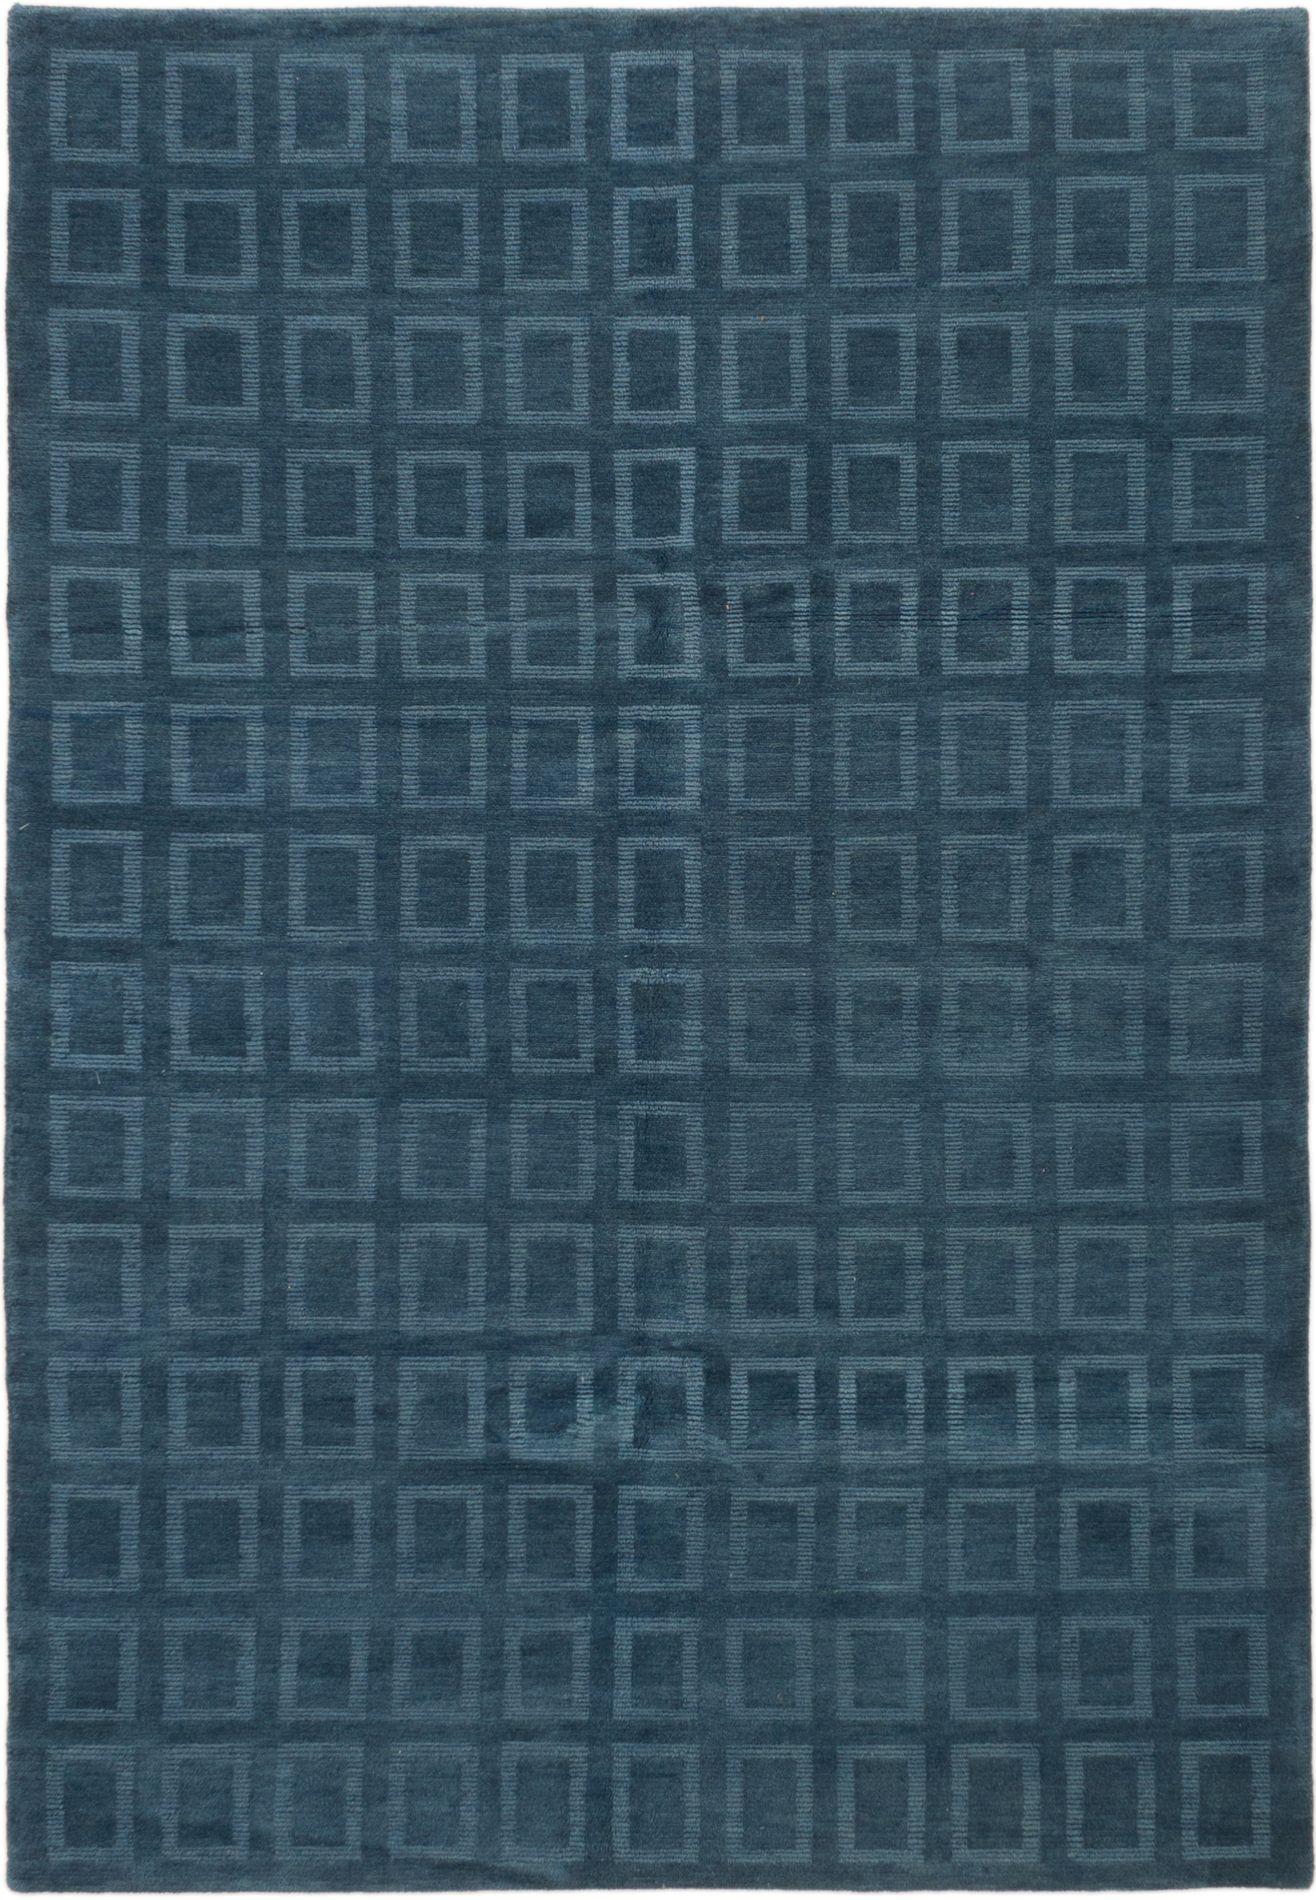 "Hand-knotted Karma Dark Baby Blue Wool Rug 6'0"" x 8'9"" Size: 6'0"" x 8'9"""